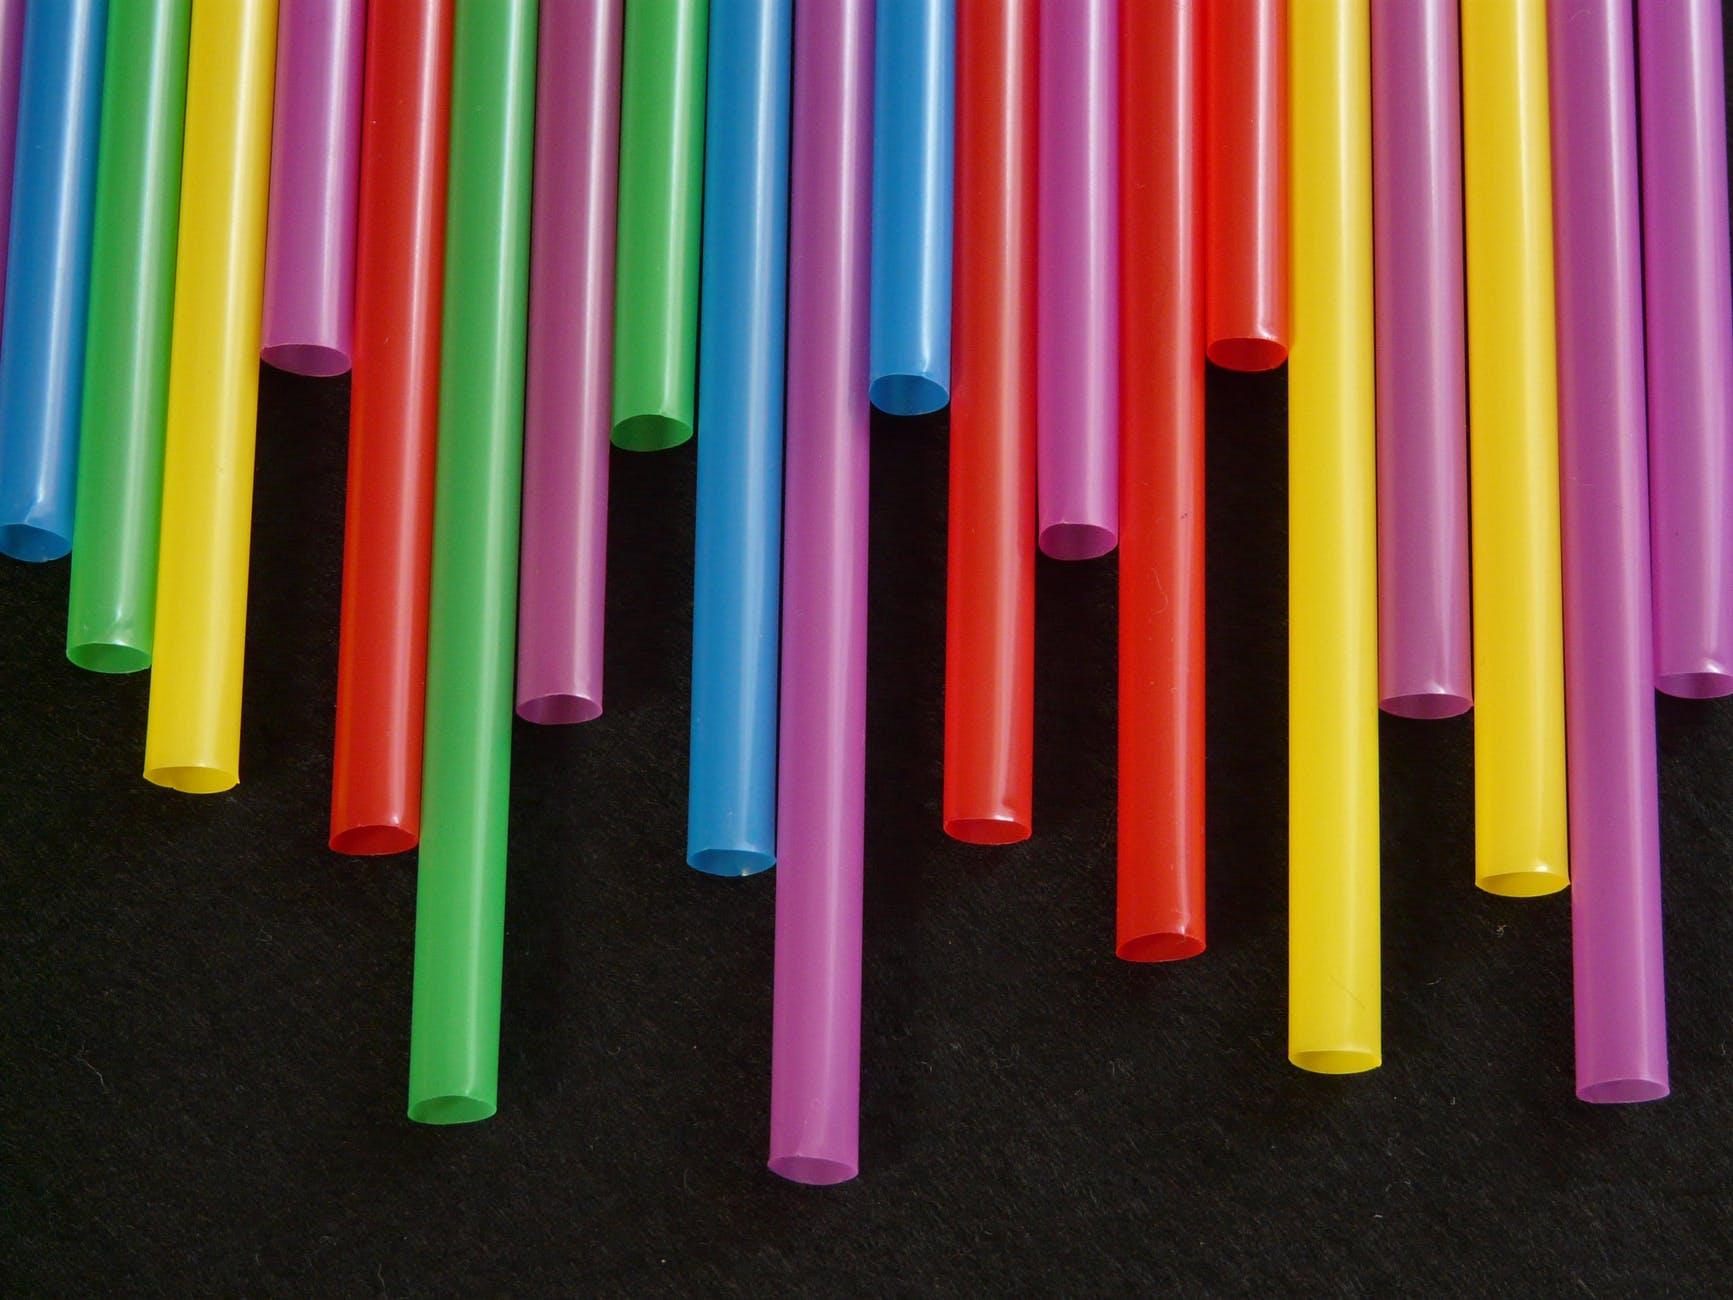 straws-tube-plastic-colorful-65612.jpeg